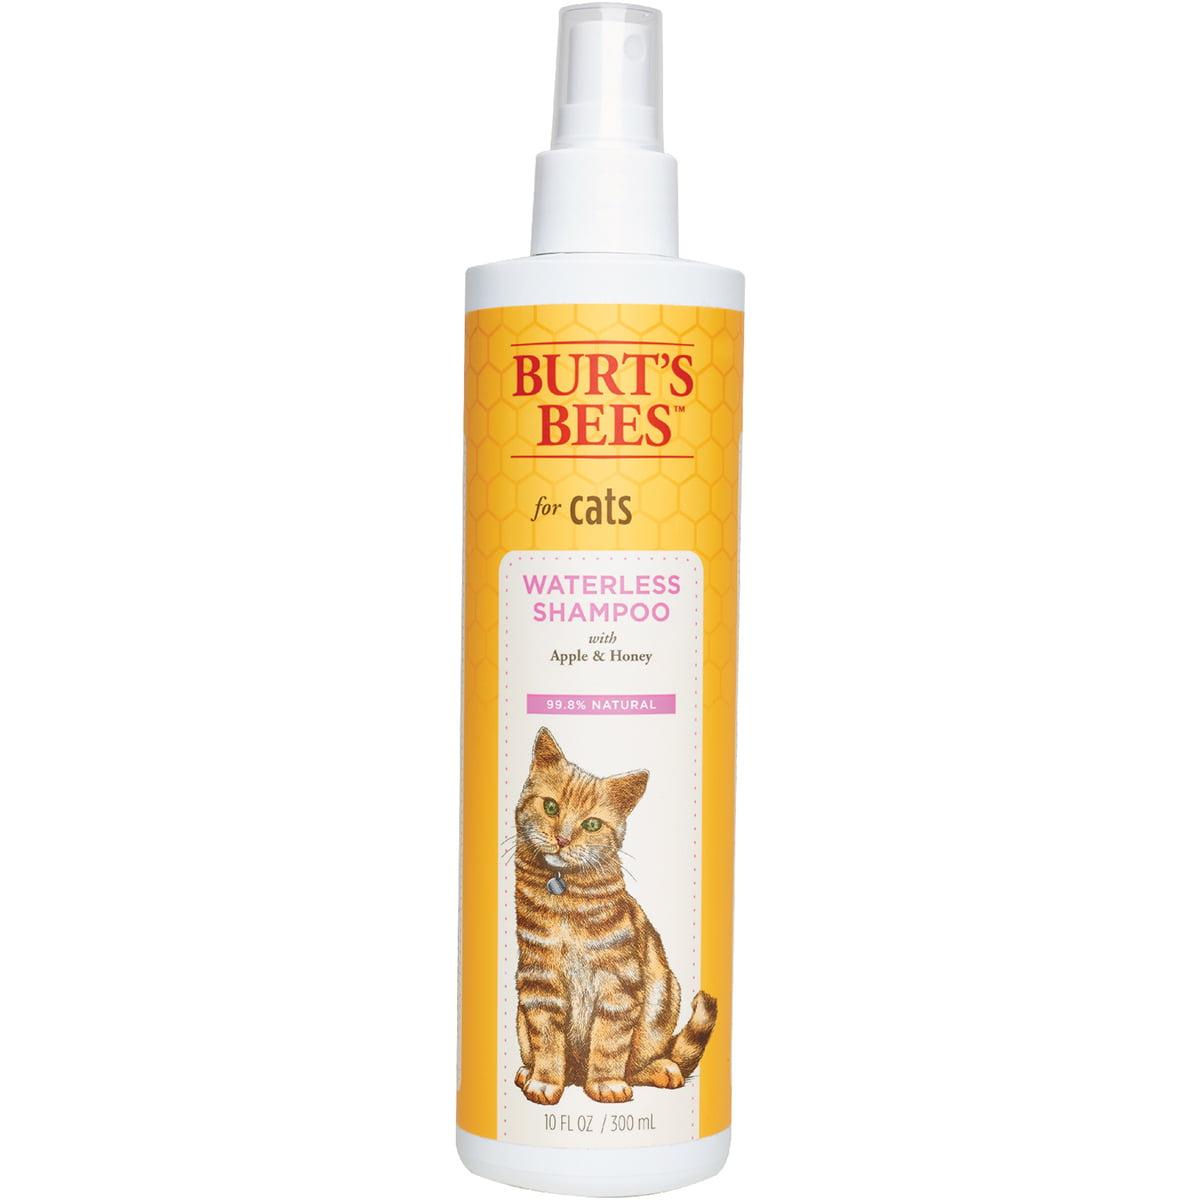 Fetch For Pets Burt's Bees Cat Shampoo 10oz - Waterless